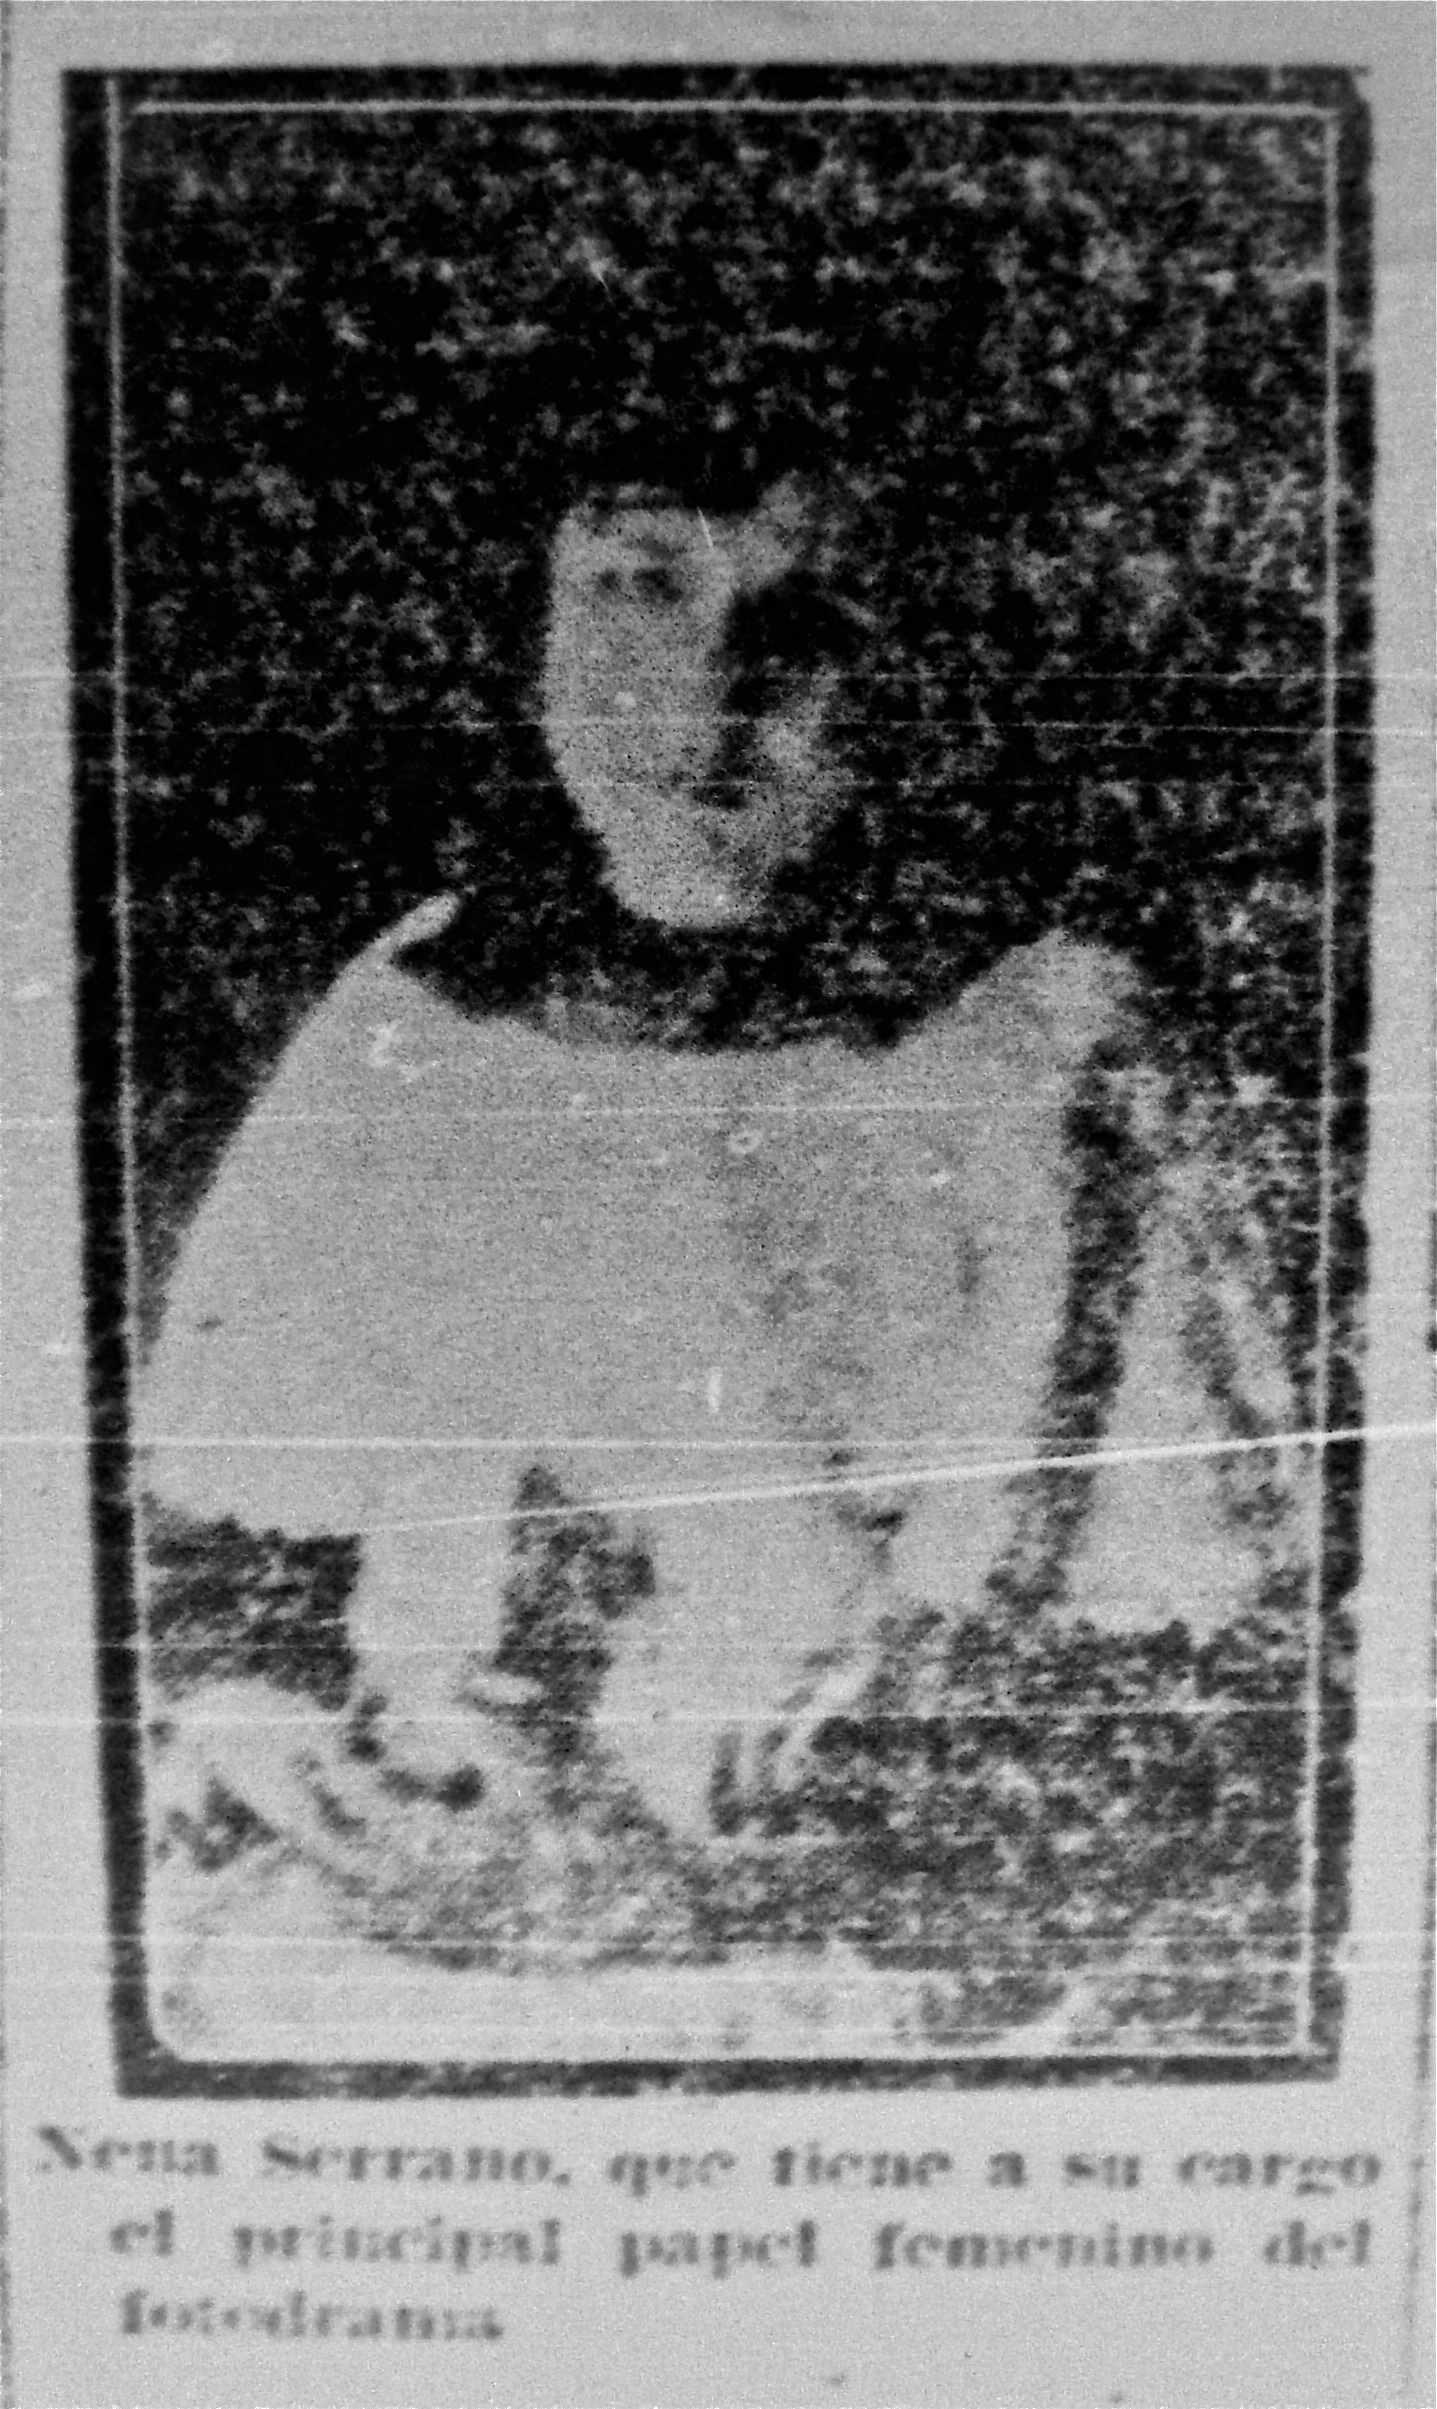 1920-10-25_LUNStgo; HoyPresentaAlhambra_UnodeAbajo (6foto_serrano)_29032013.JPG